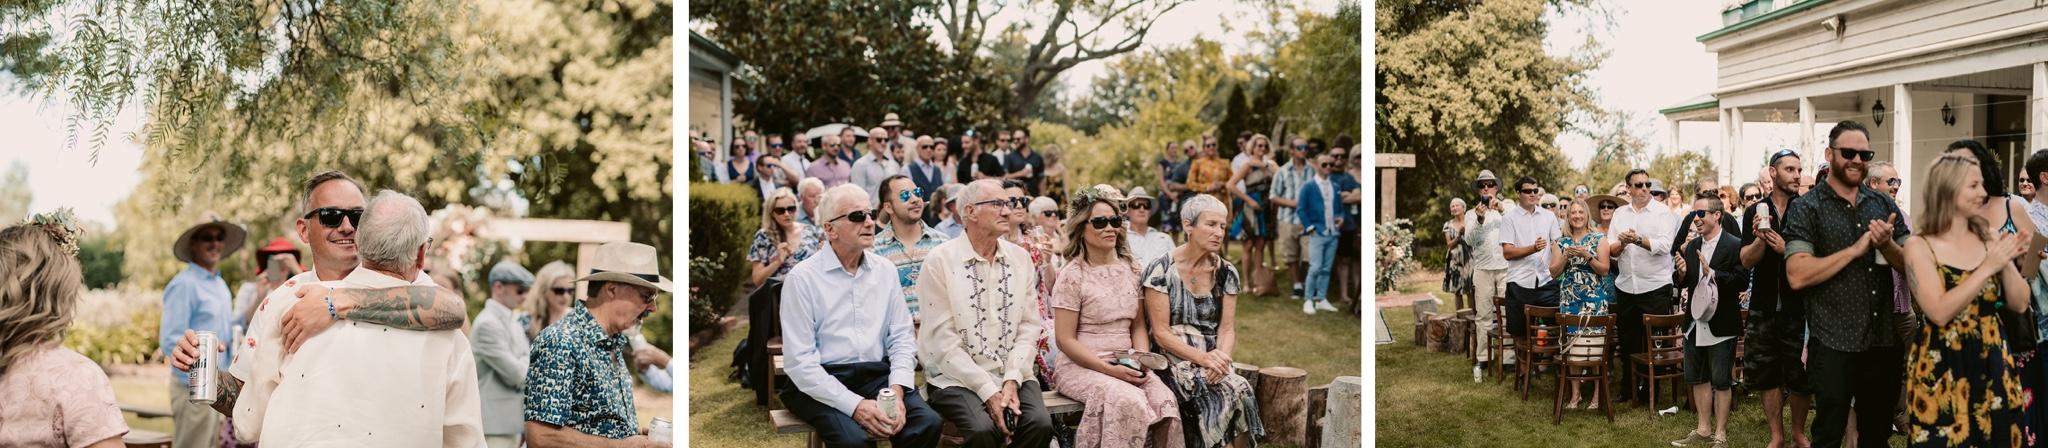 Wedstival Festival Wedding Photographer Yarra Valley60.jpg